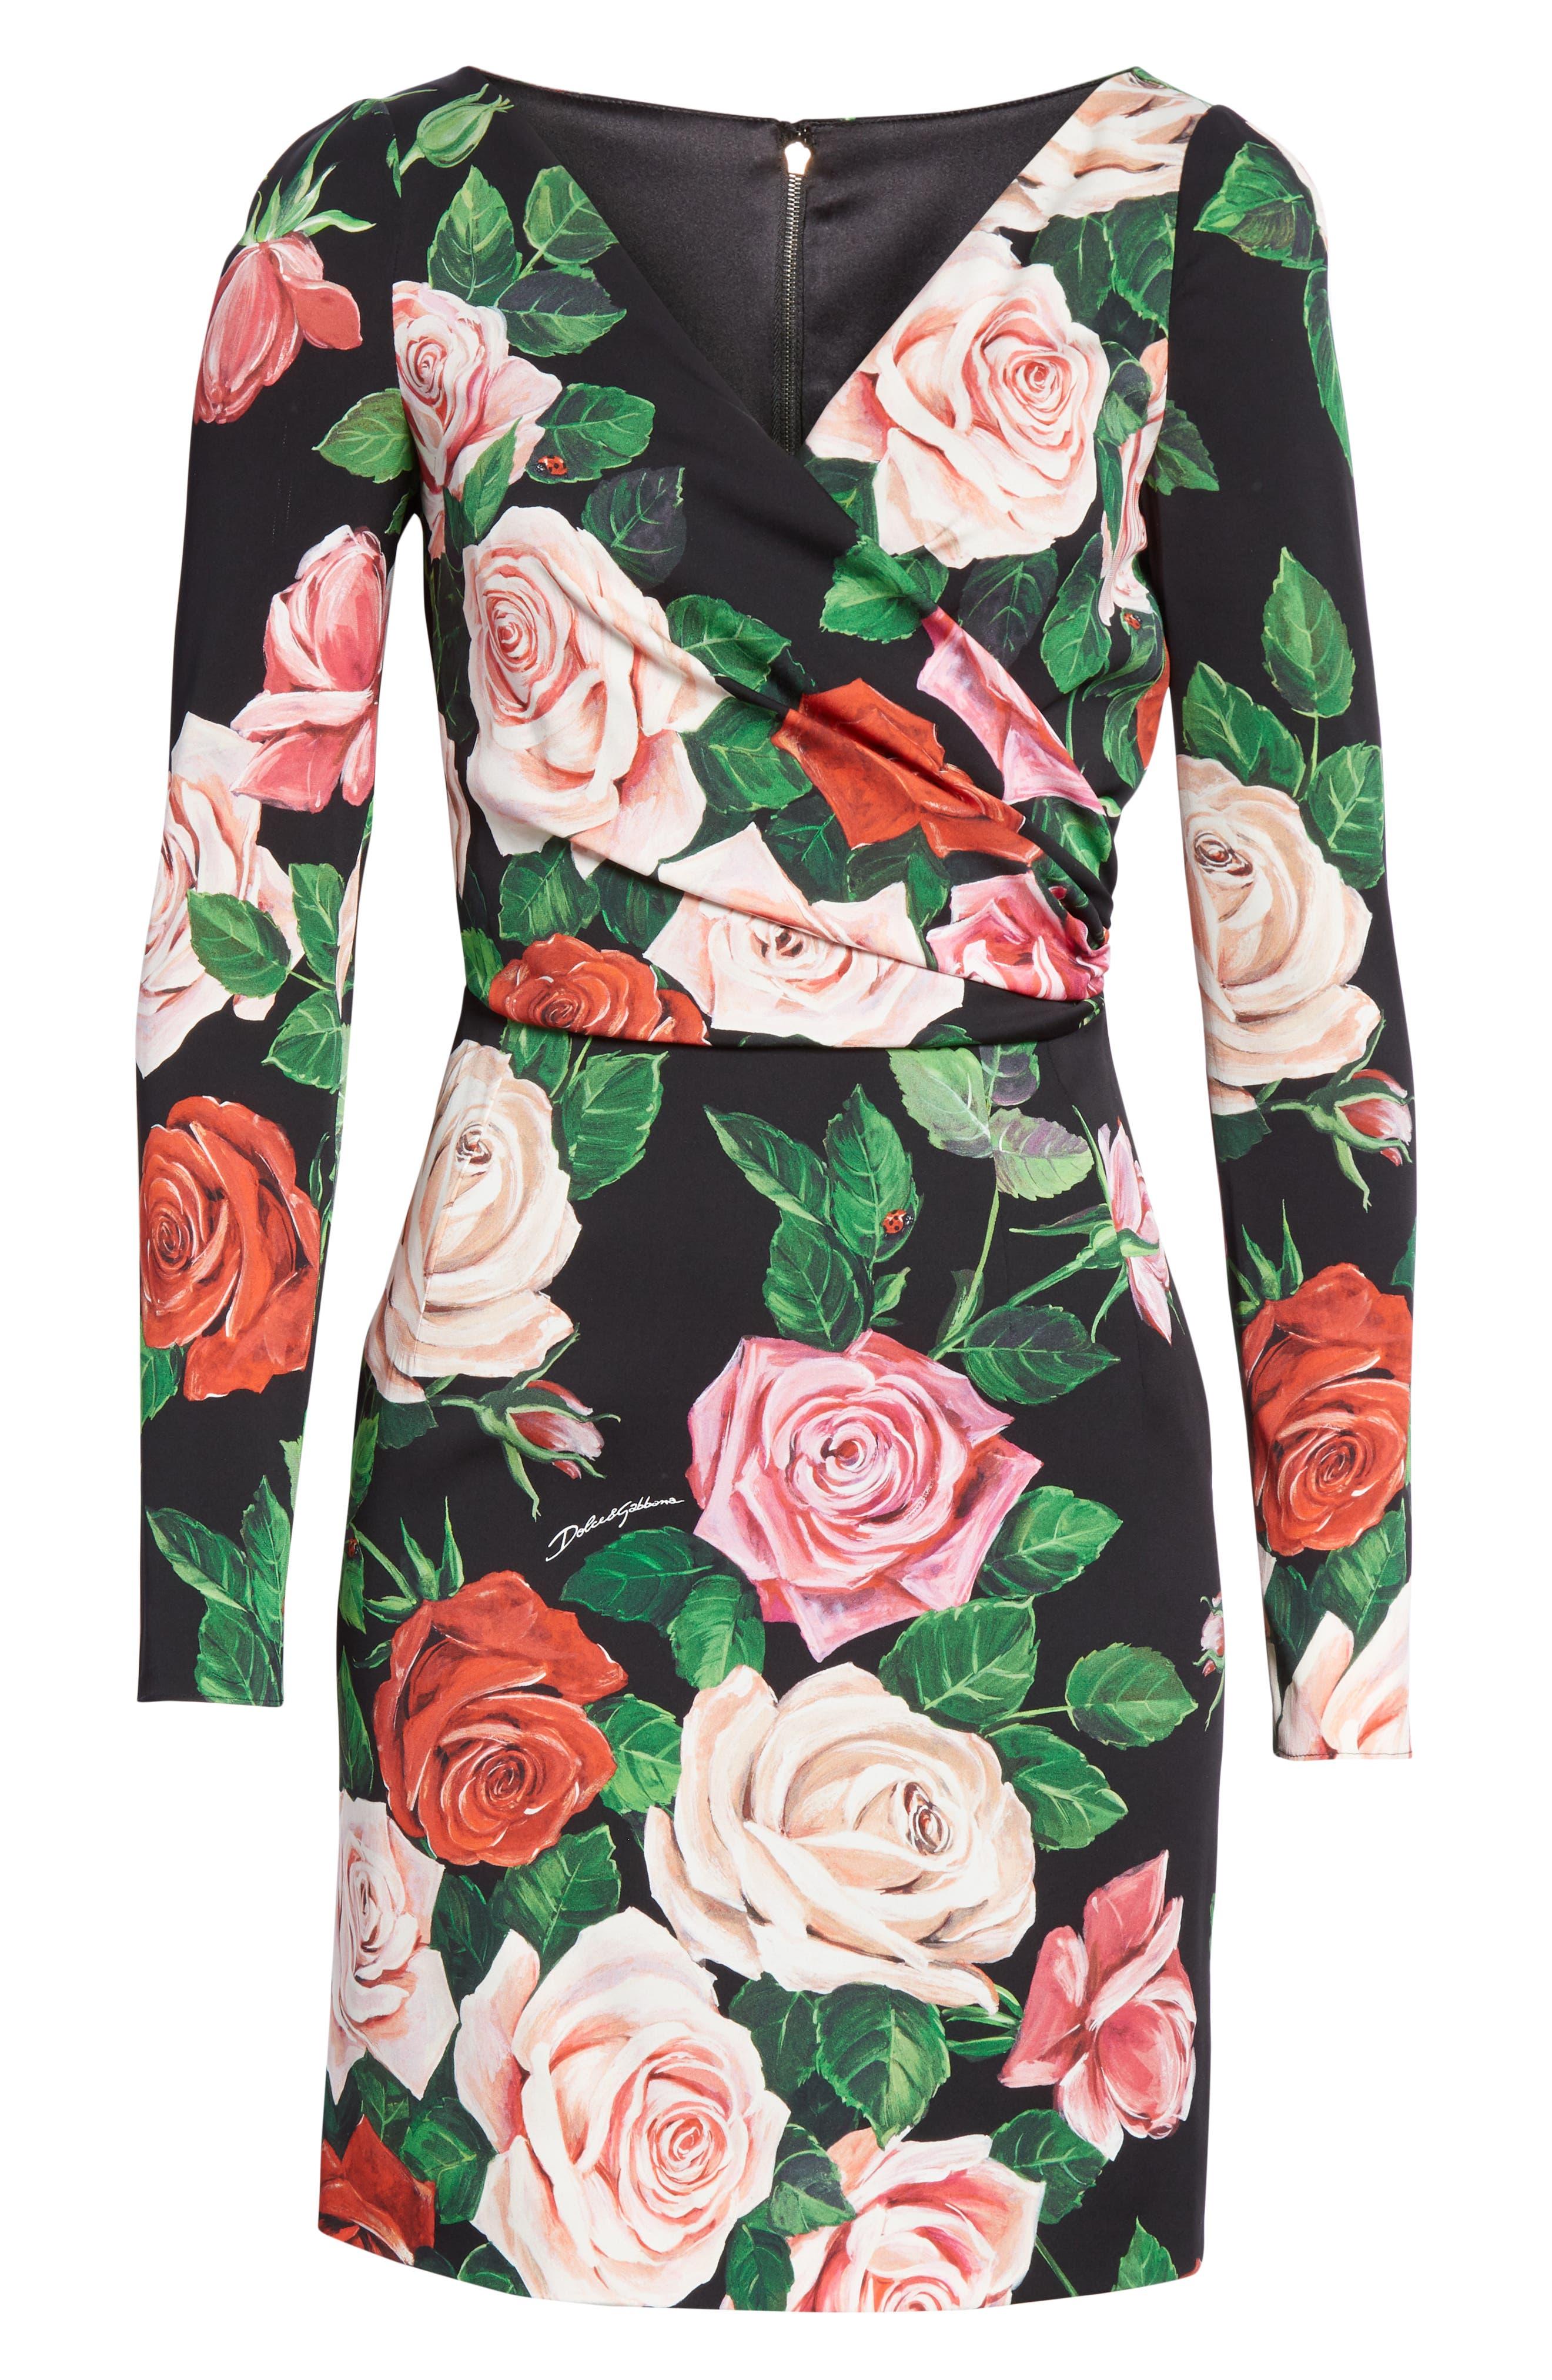 Rose Print Stretch Silk Dress,                             Alternate thumbnail 7, color,                             BLACK ROSE